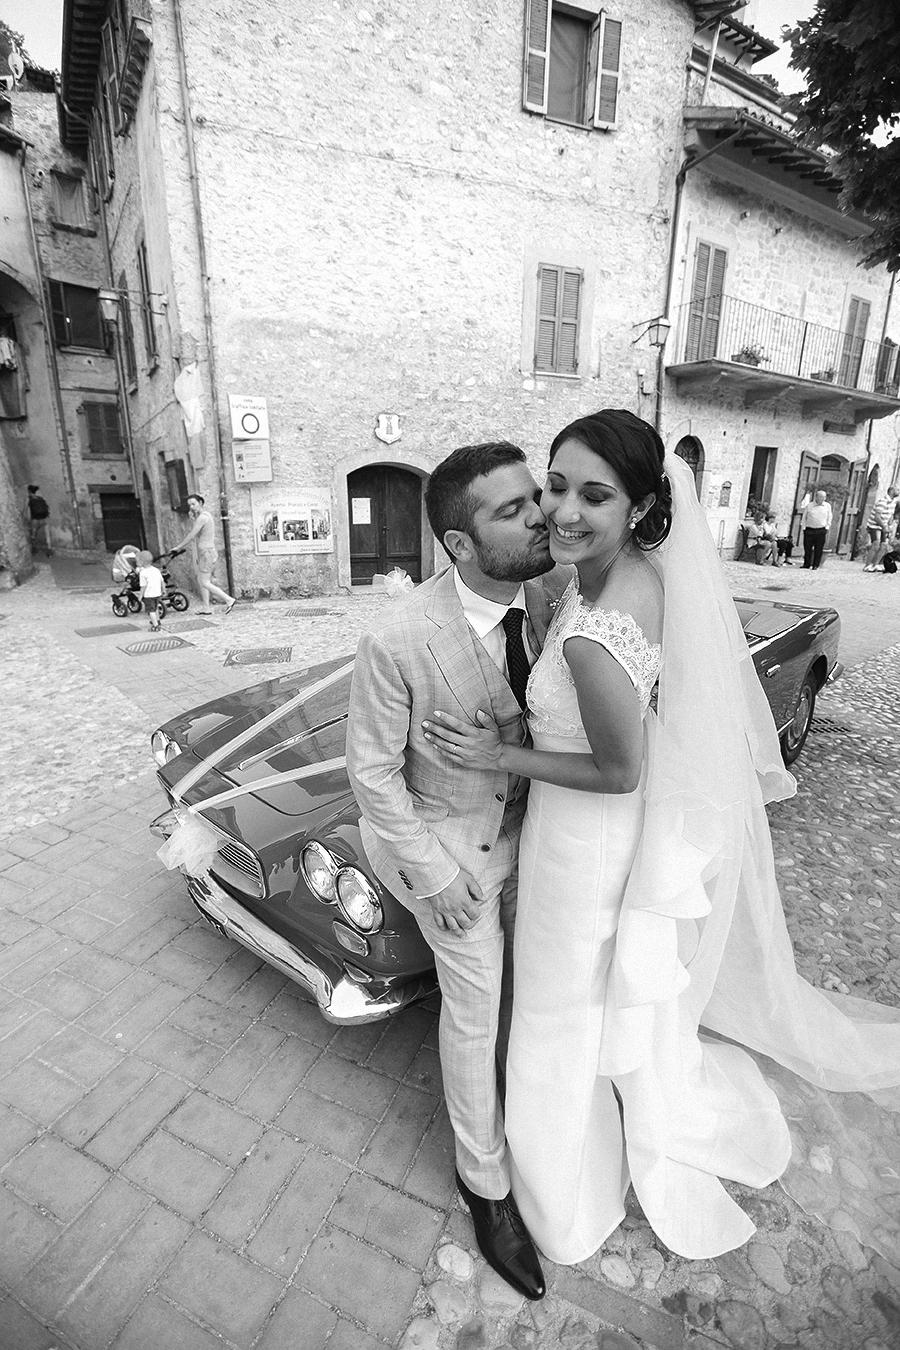 italy wedding photography by kurt ahs . alex + silvia ( washington united states ) . 7391.jpg